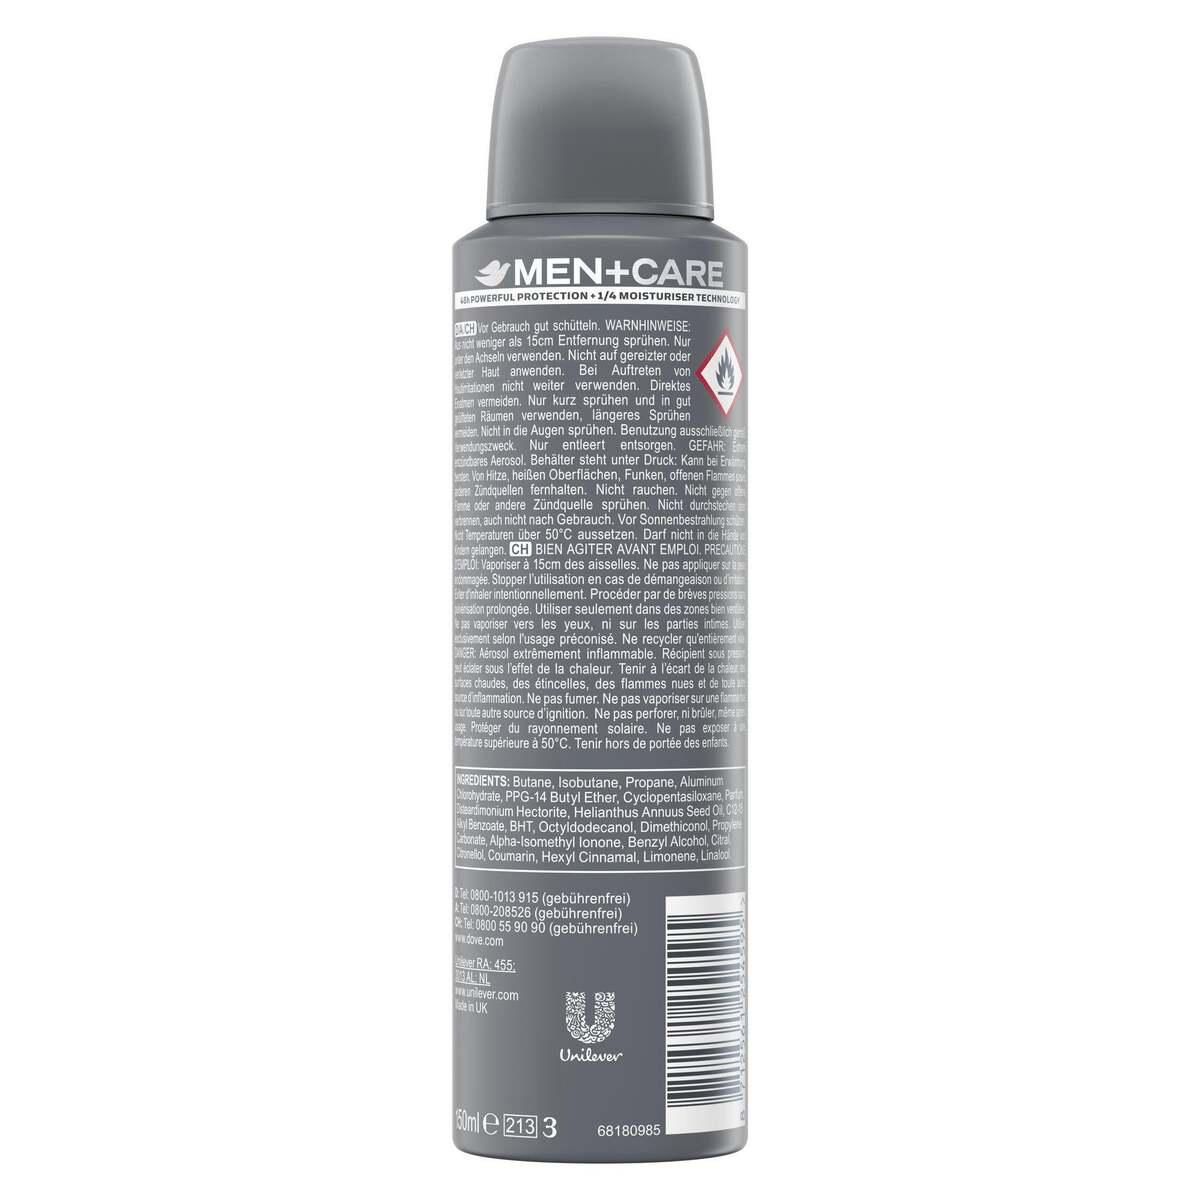 Bild 2 von Dove Men+Care              Clean Comfort Deo-Spray